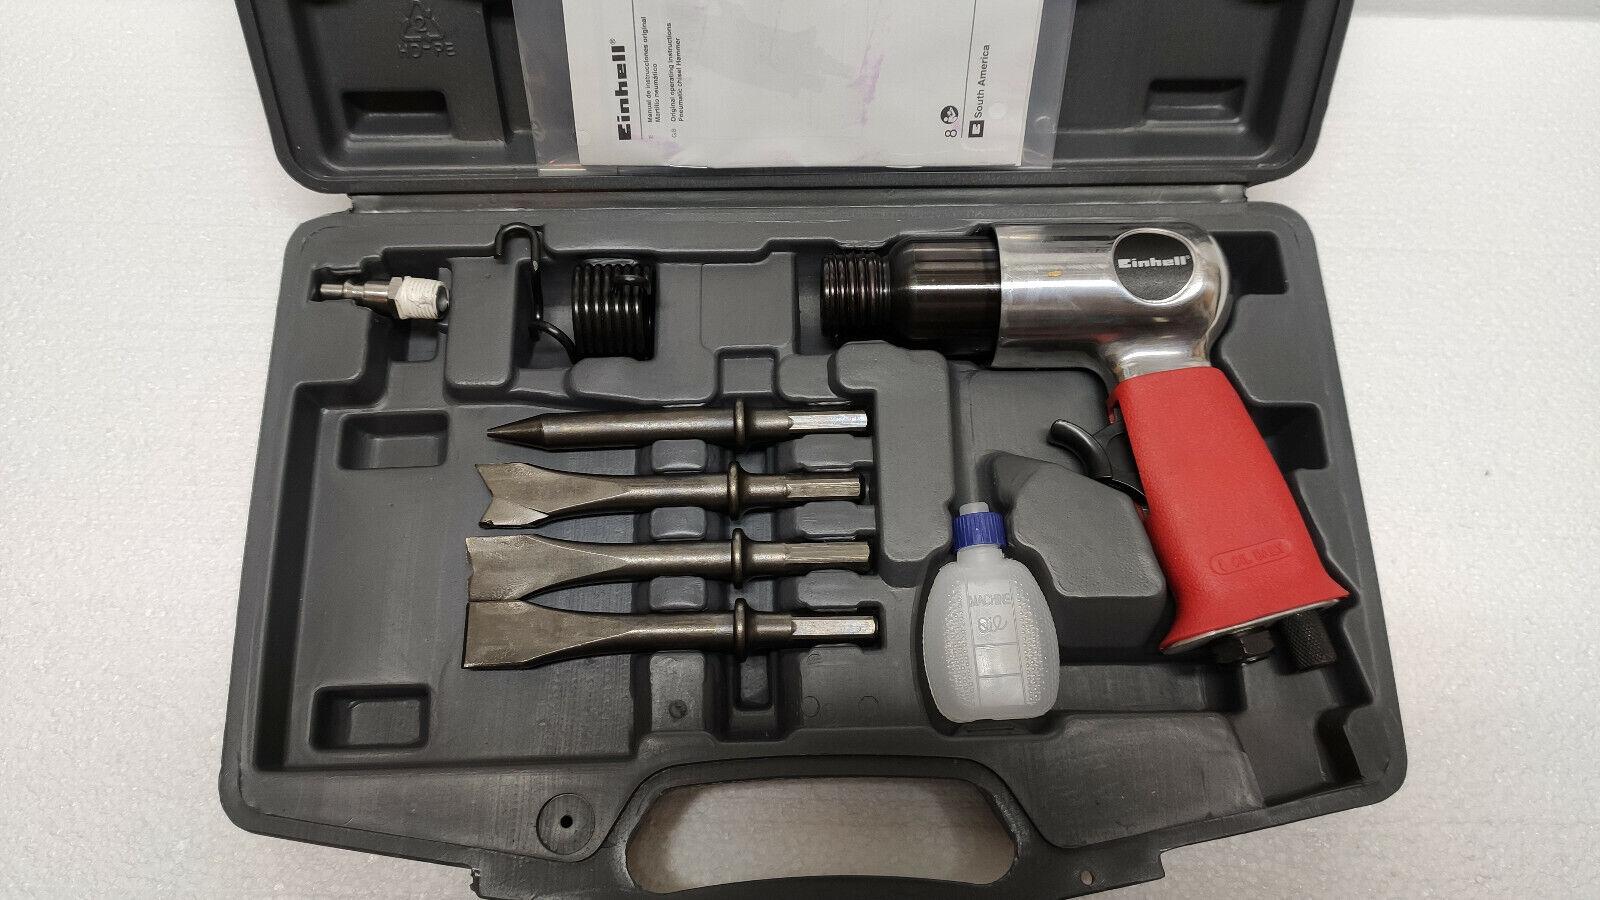 UVP49,95 Einhell DMH 250//2 Druckluftmeißel Set Meißelhammer Stemmhammer Kfz